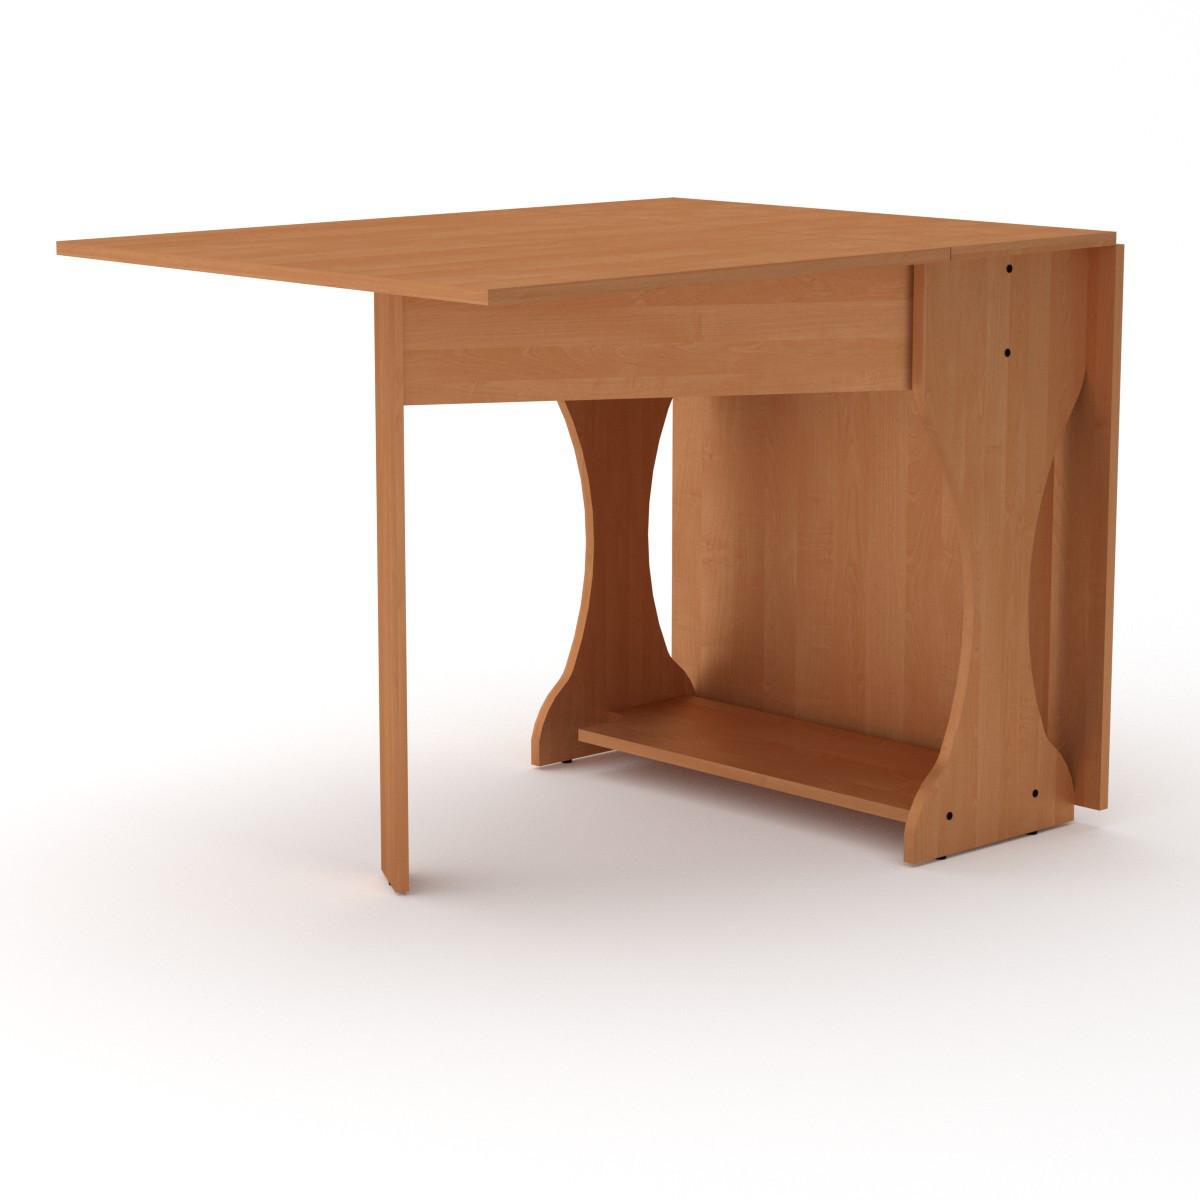 Стол книжка 4 ольха Компанит (170х33х74 см)